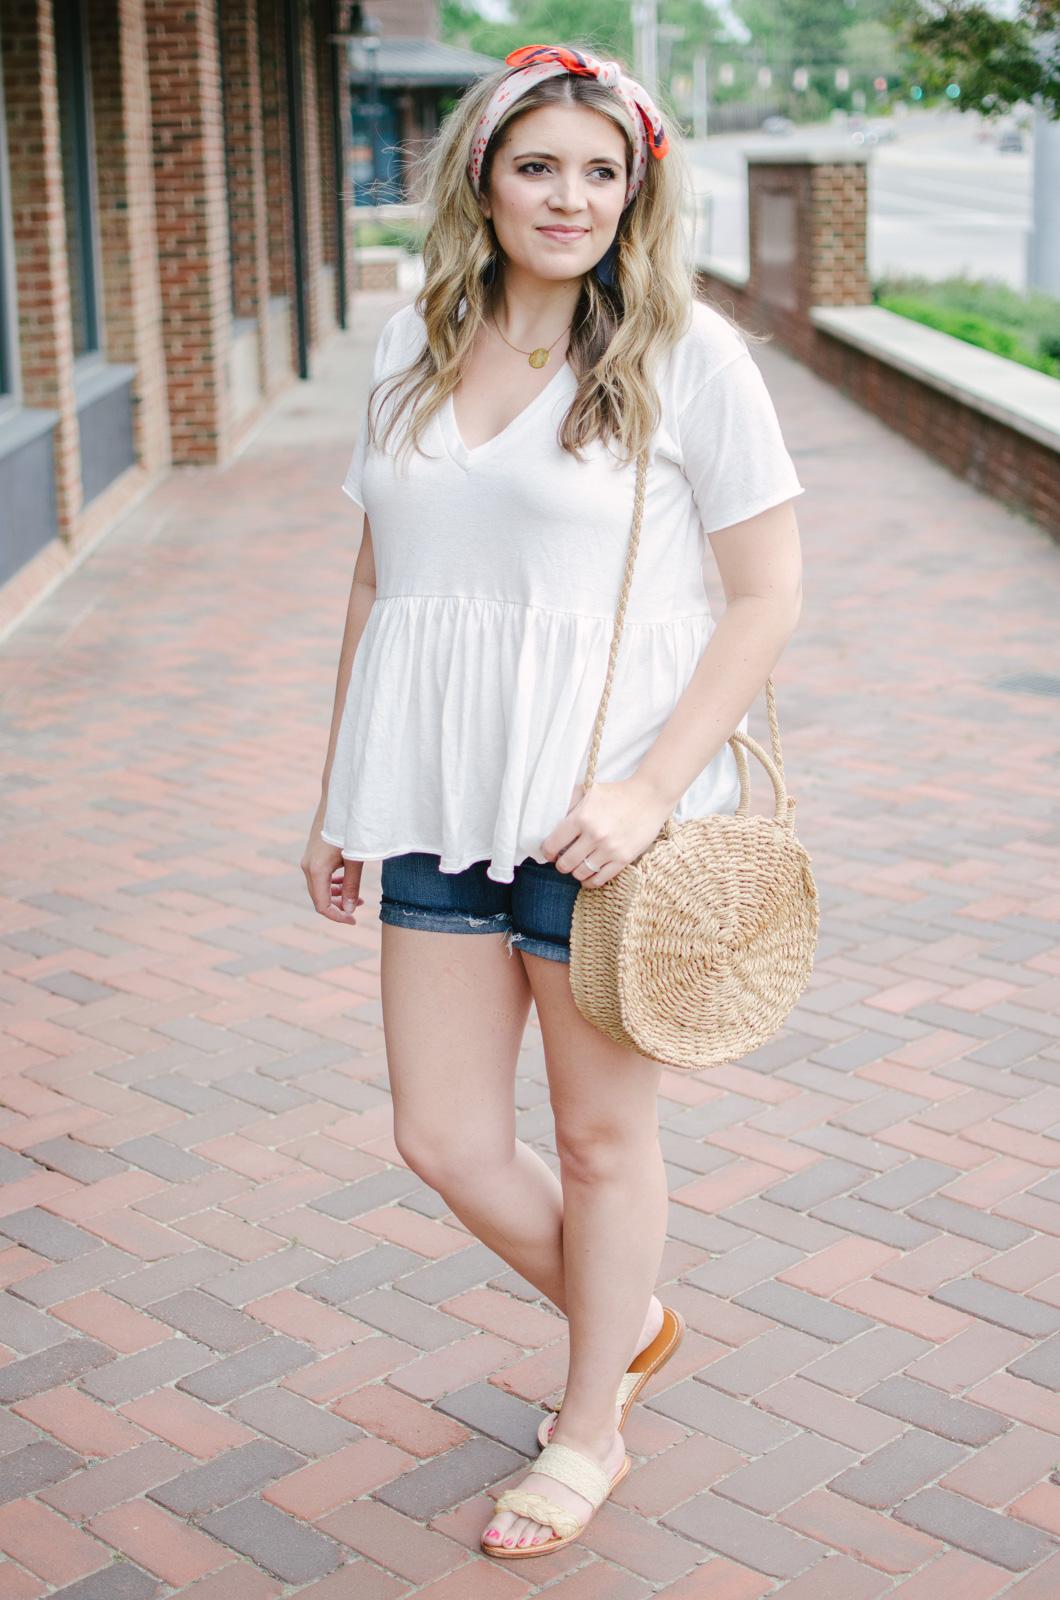 peplum top casual summer outfit | bylaurenm.com